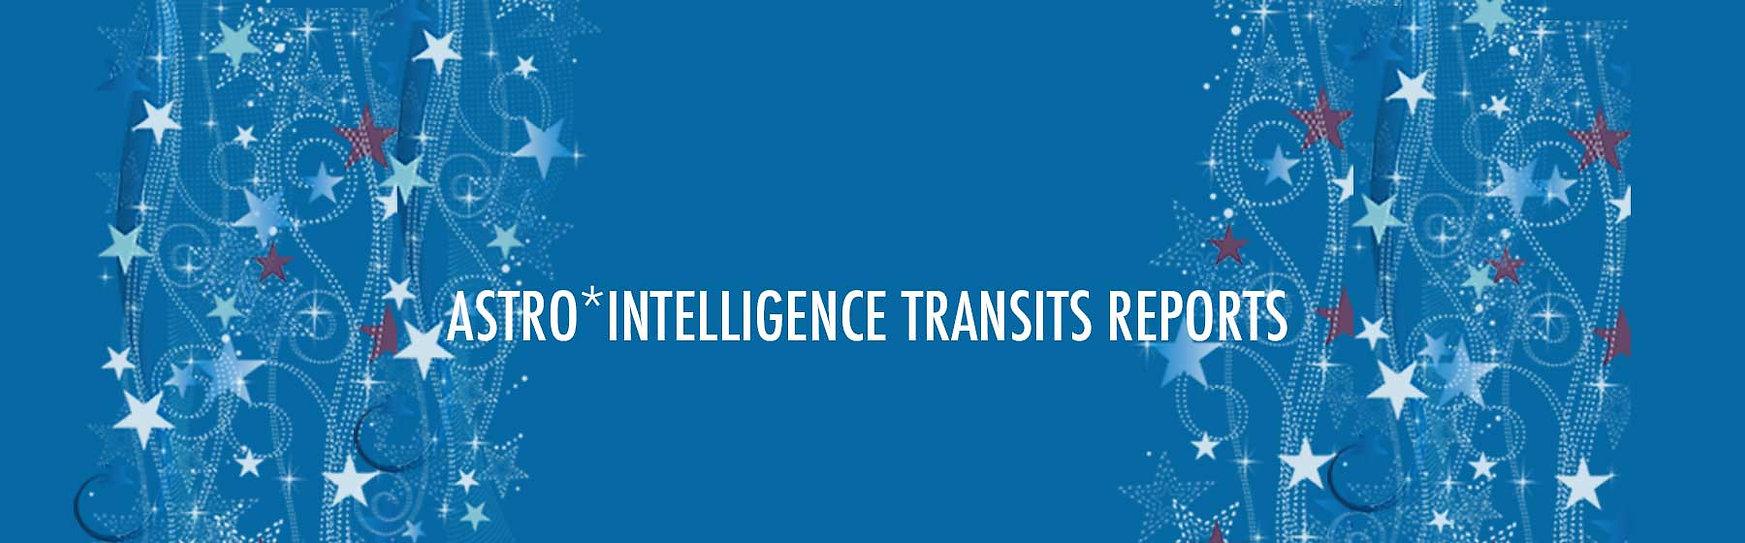 Transits_2021_hmpg.jpg